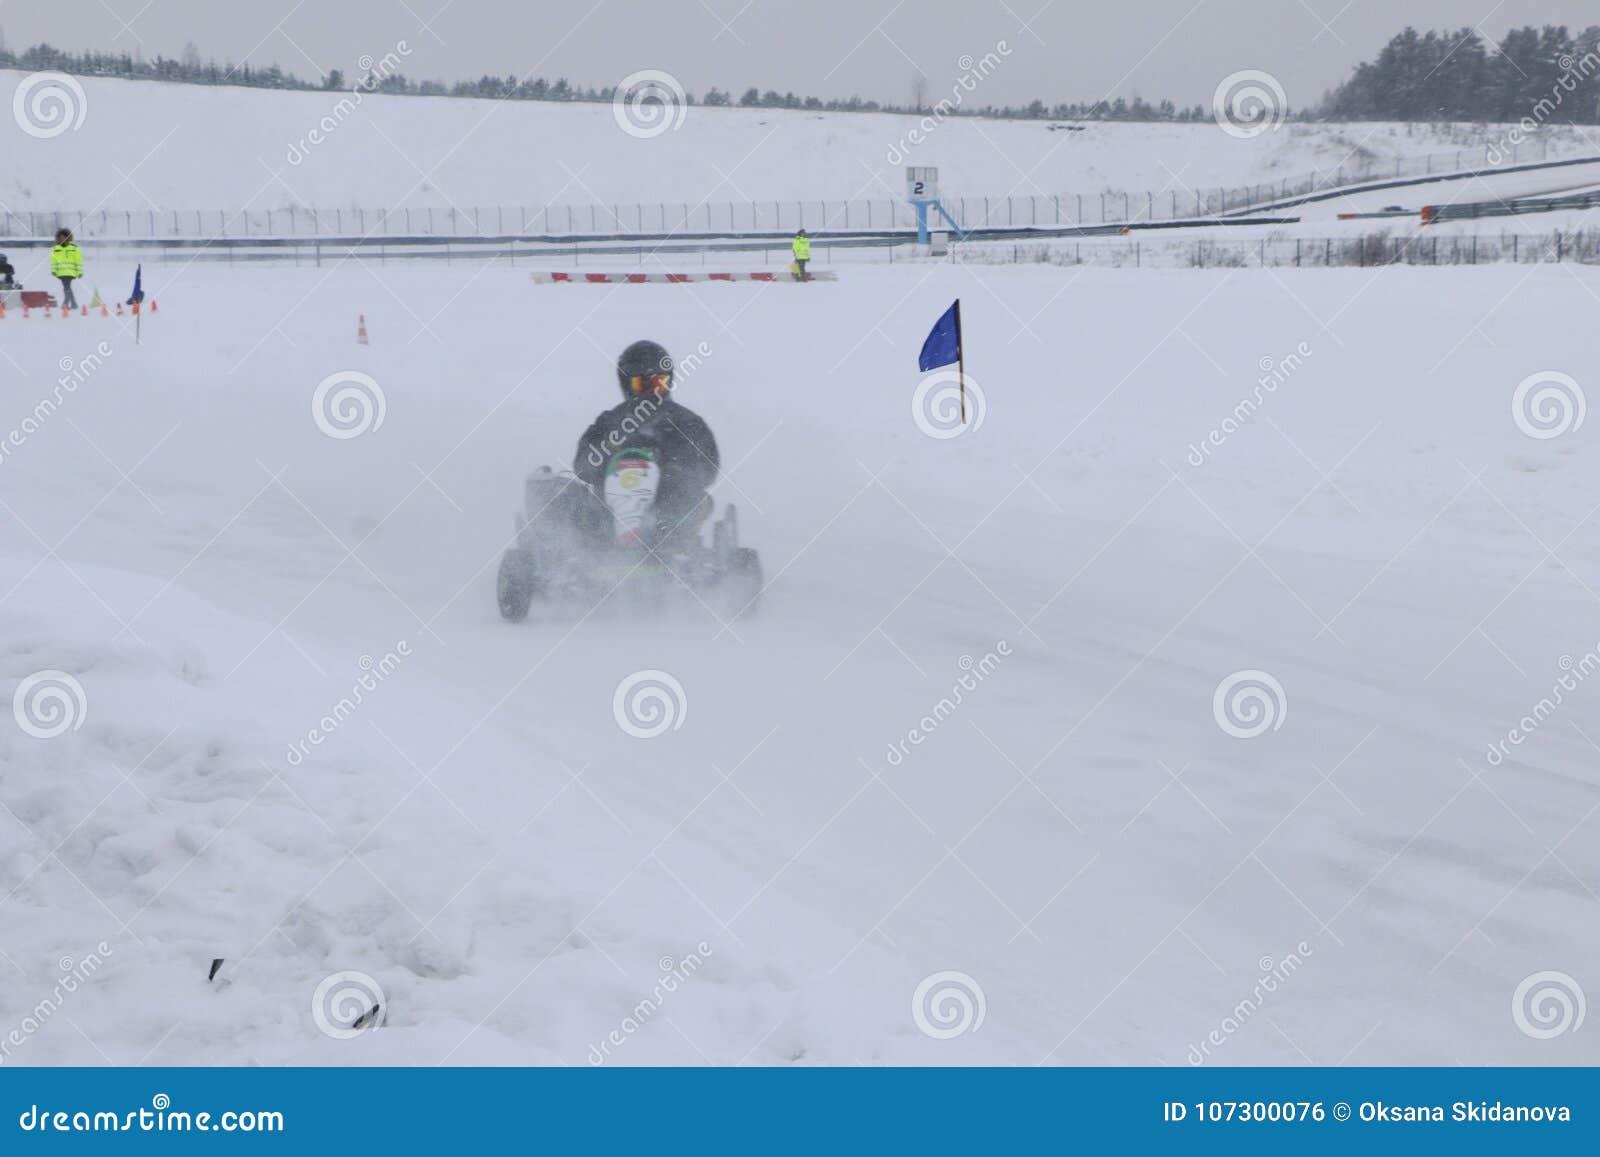 KAZAN, RUSSIA - DECEMBER 23, 2017: Opening of the Winter Season